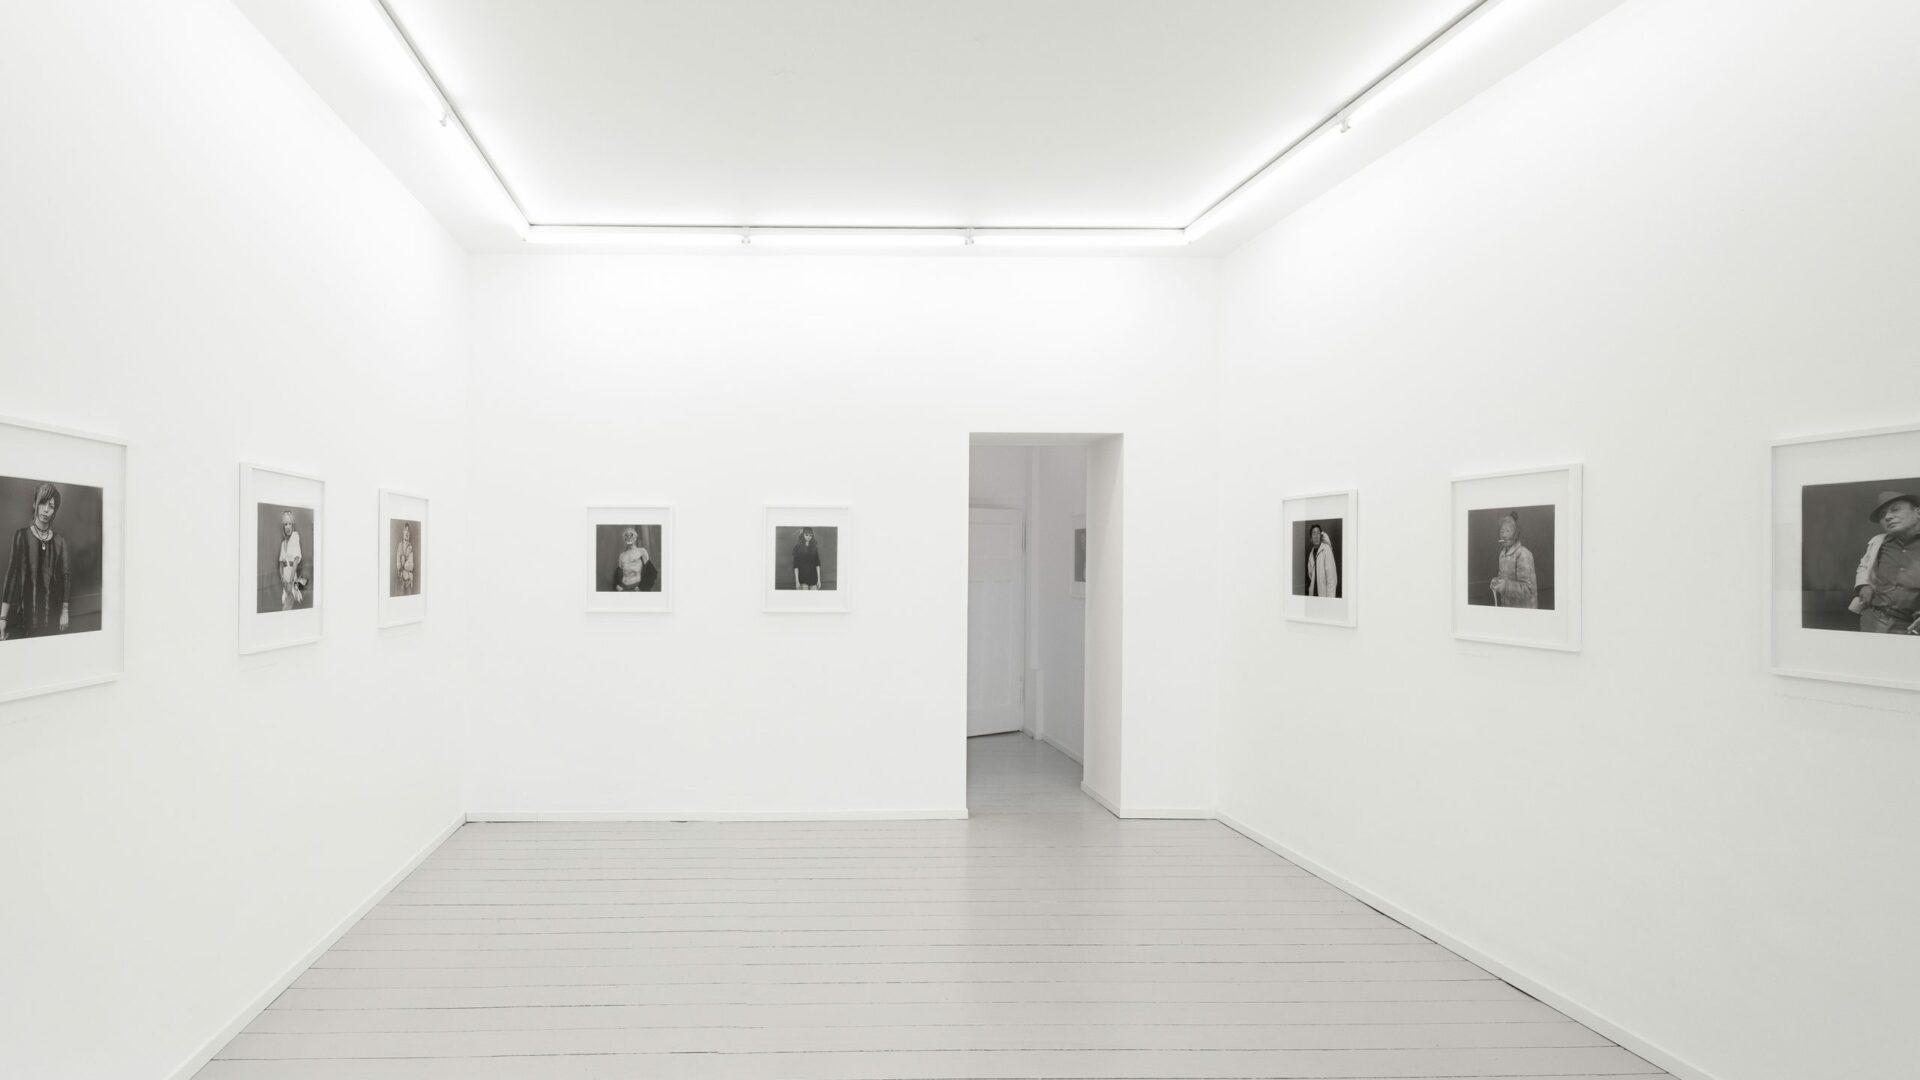 Hiroh Kikai_Persona, the final chapter_basedonart gallery_düsseldorf